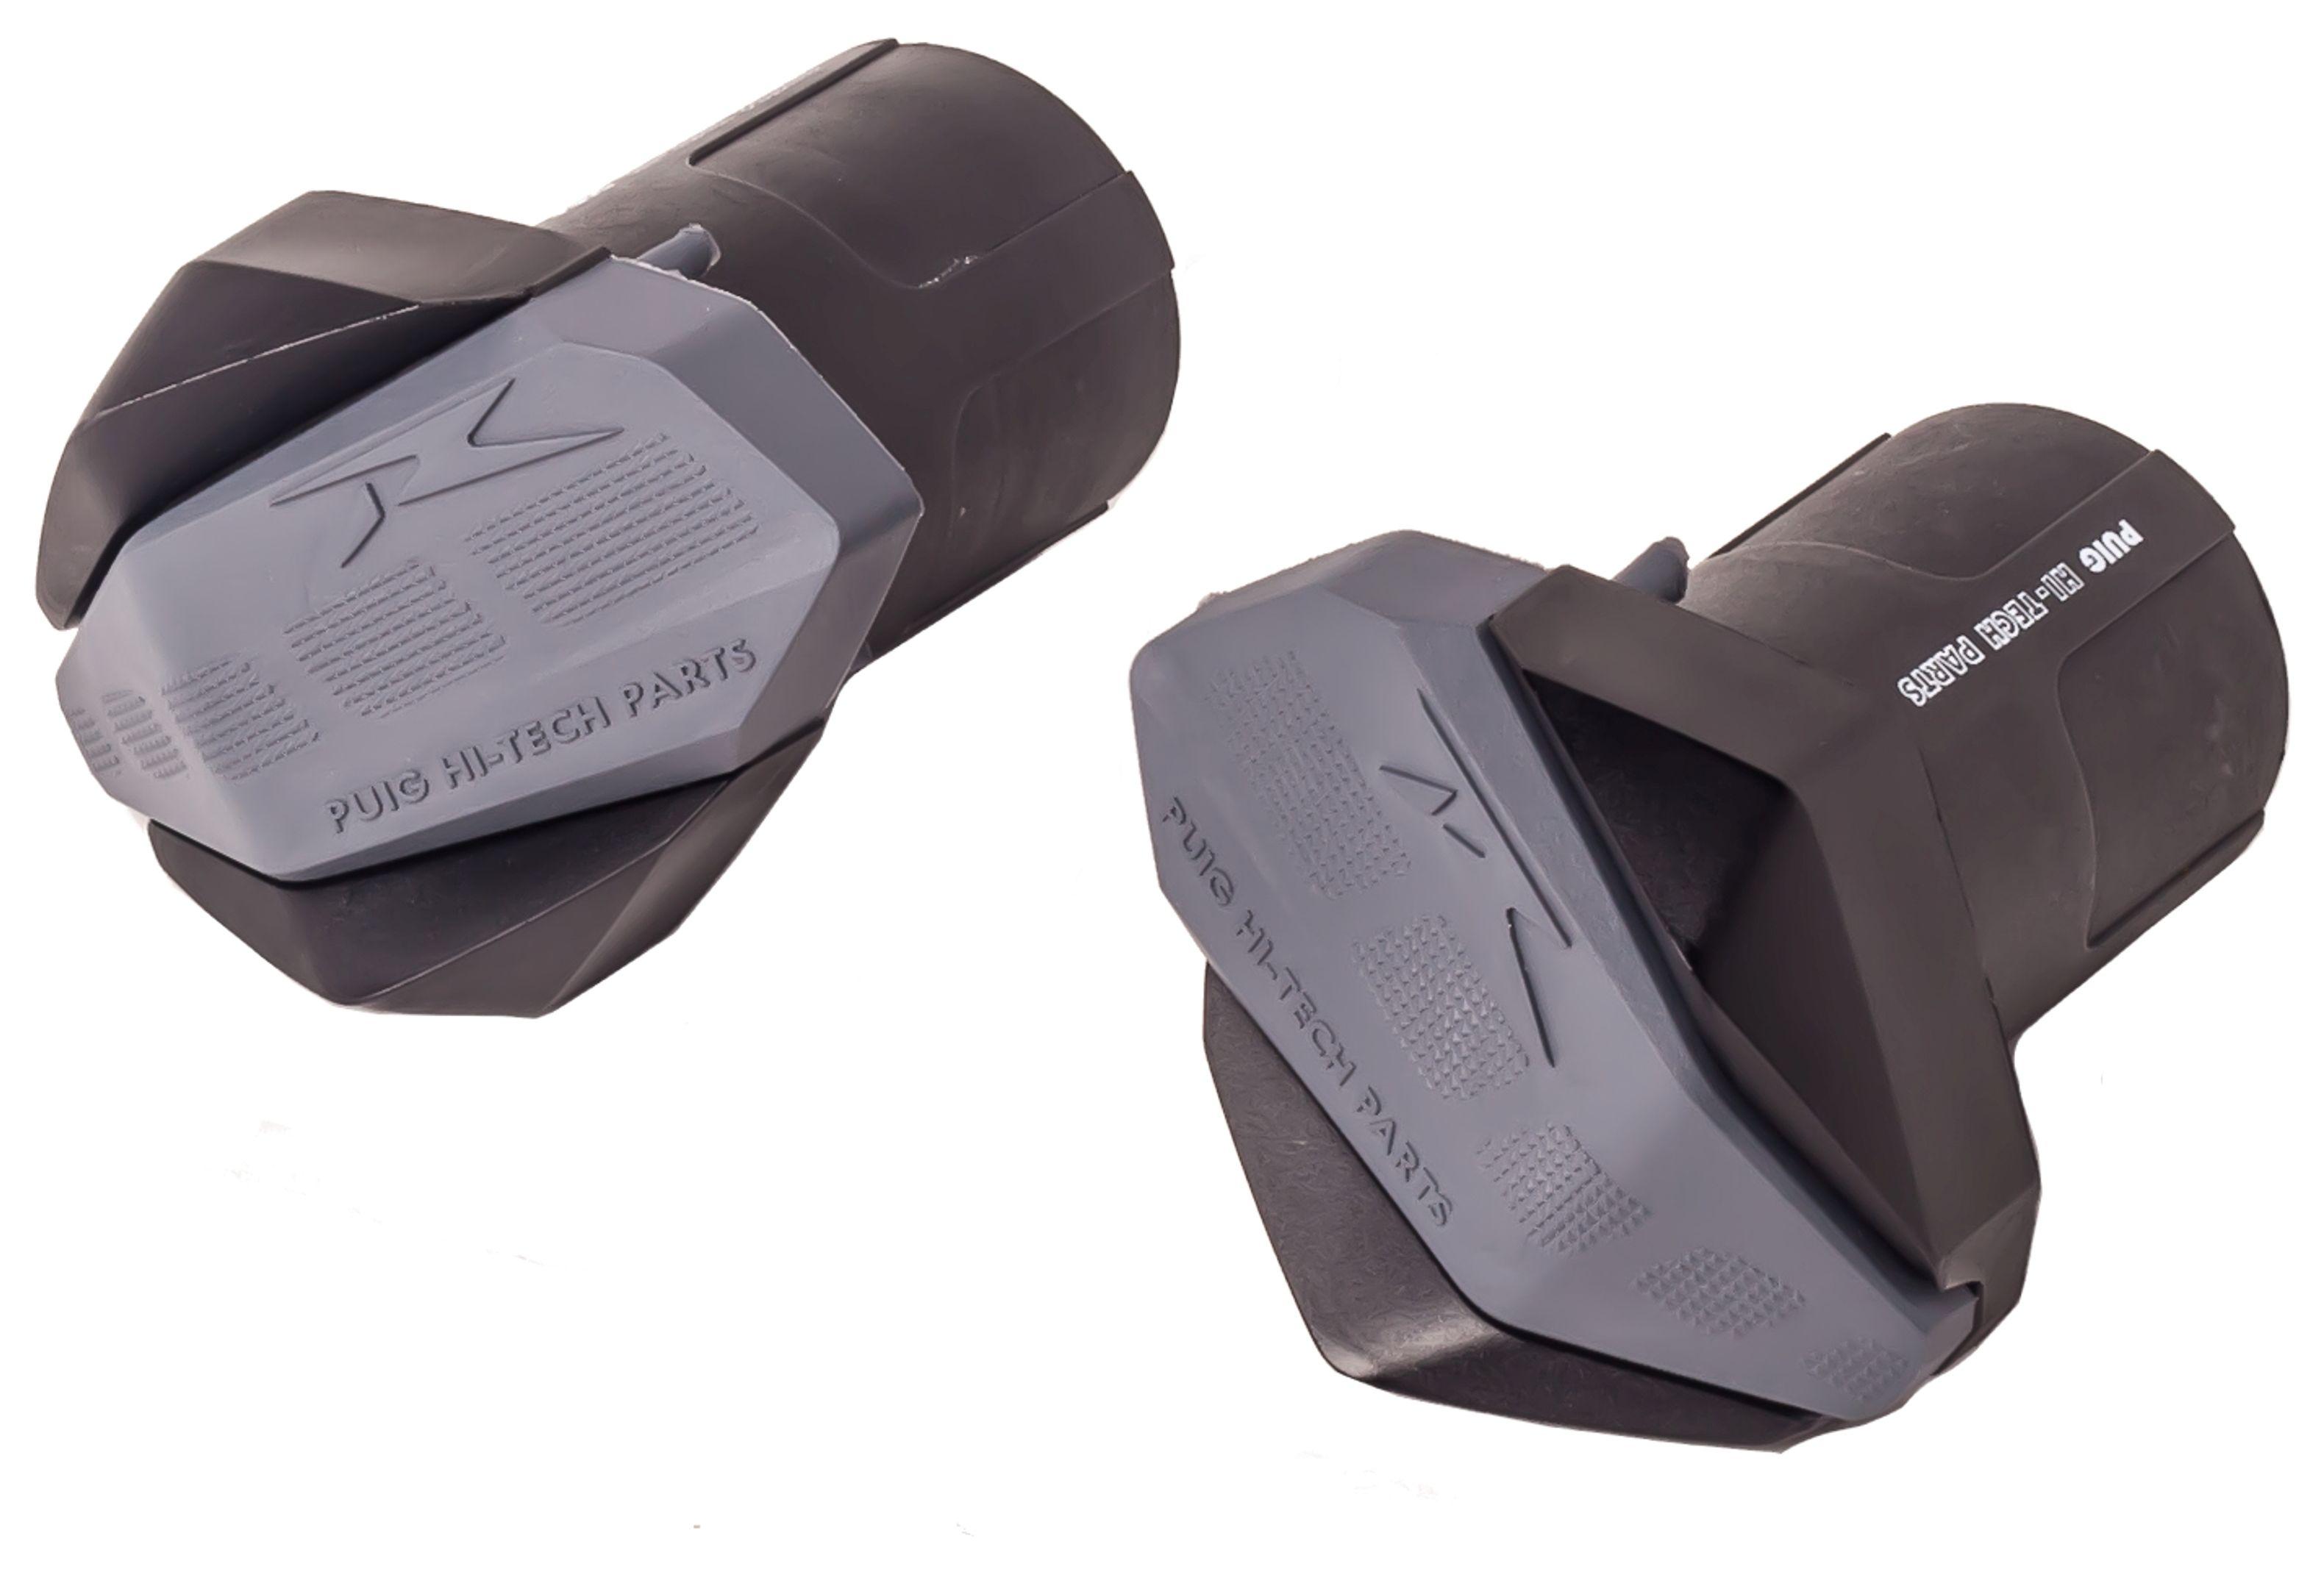 No Cut Frame Sliders Motorcycle Fairing Protectors For 2005 Honda CB600F 599 Hornet